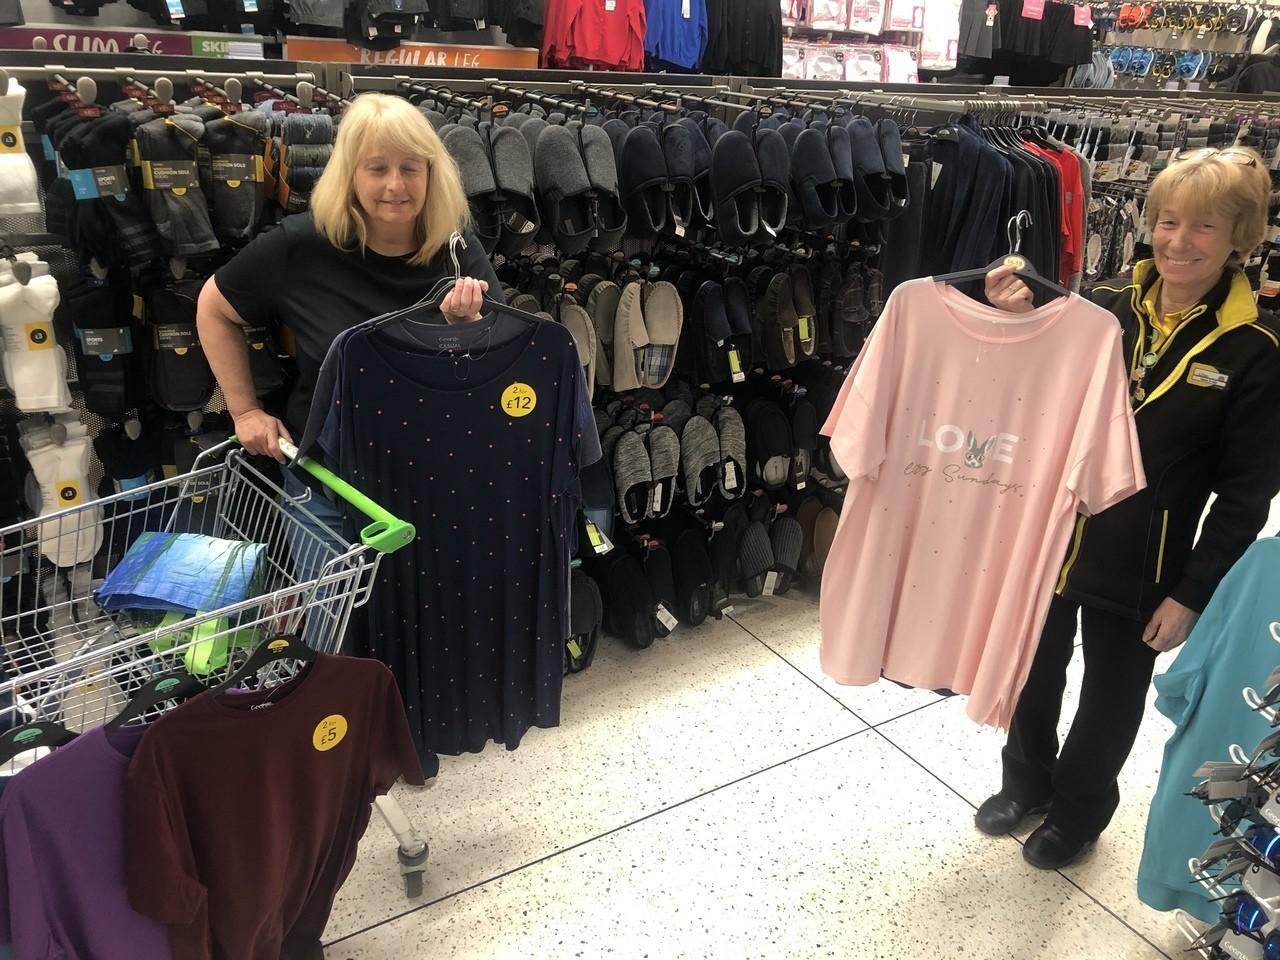 Nightwear donation for local hospital | Asda Stenhousemuir